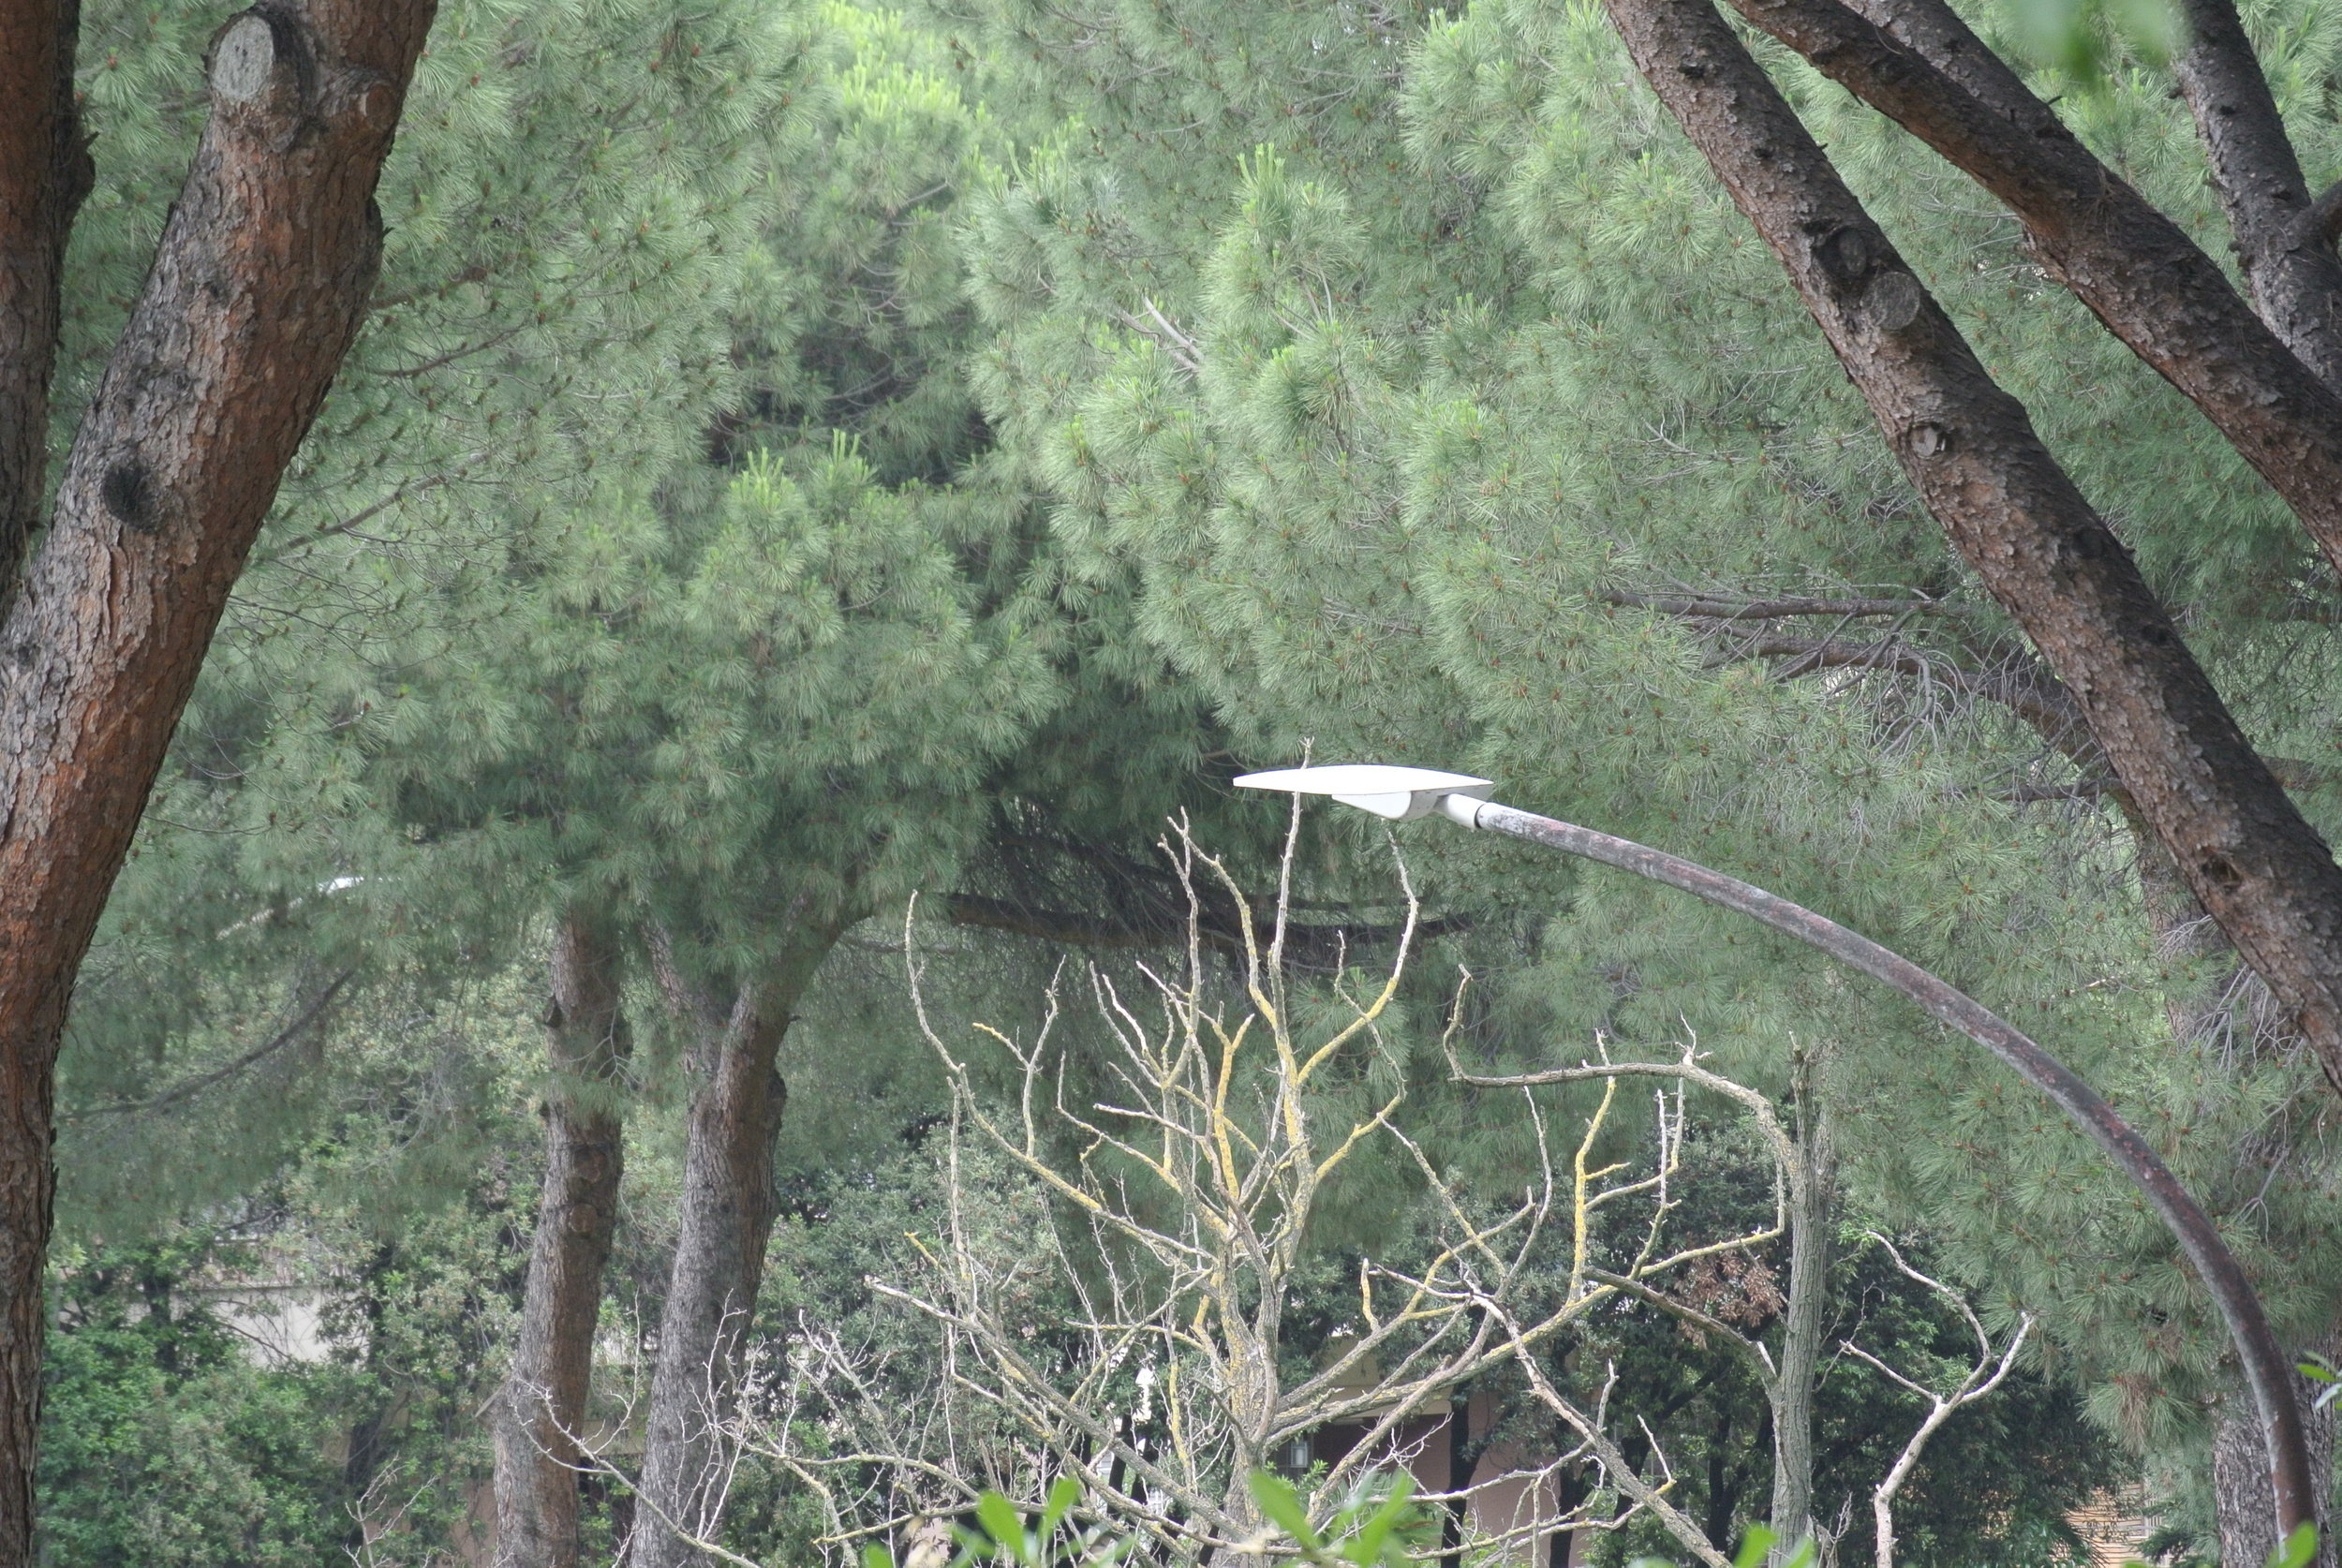 Alien Outgrowth: lamplight tentacles reach through the trees. Rome, EUR; May 2018.  ©Pamela Kerpius